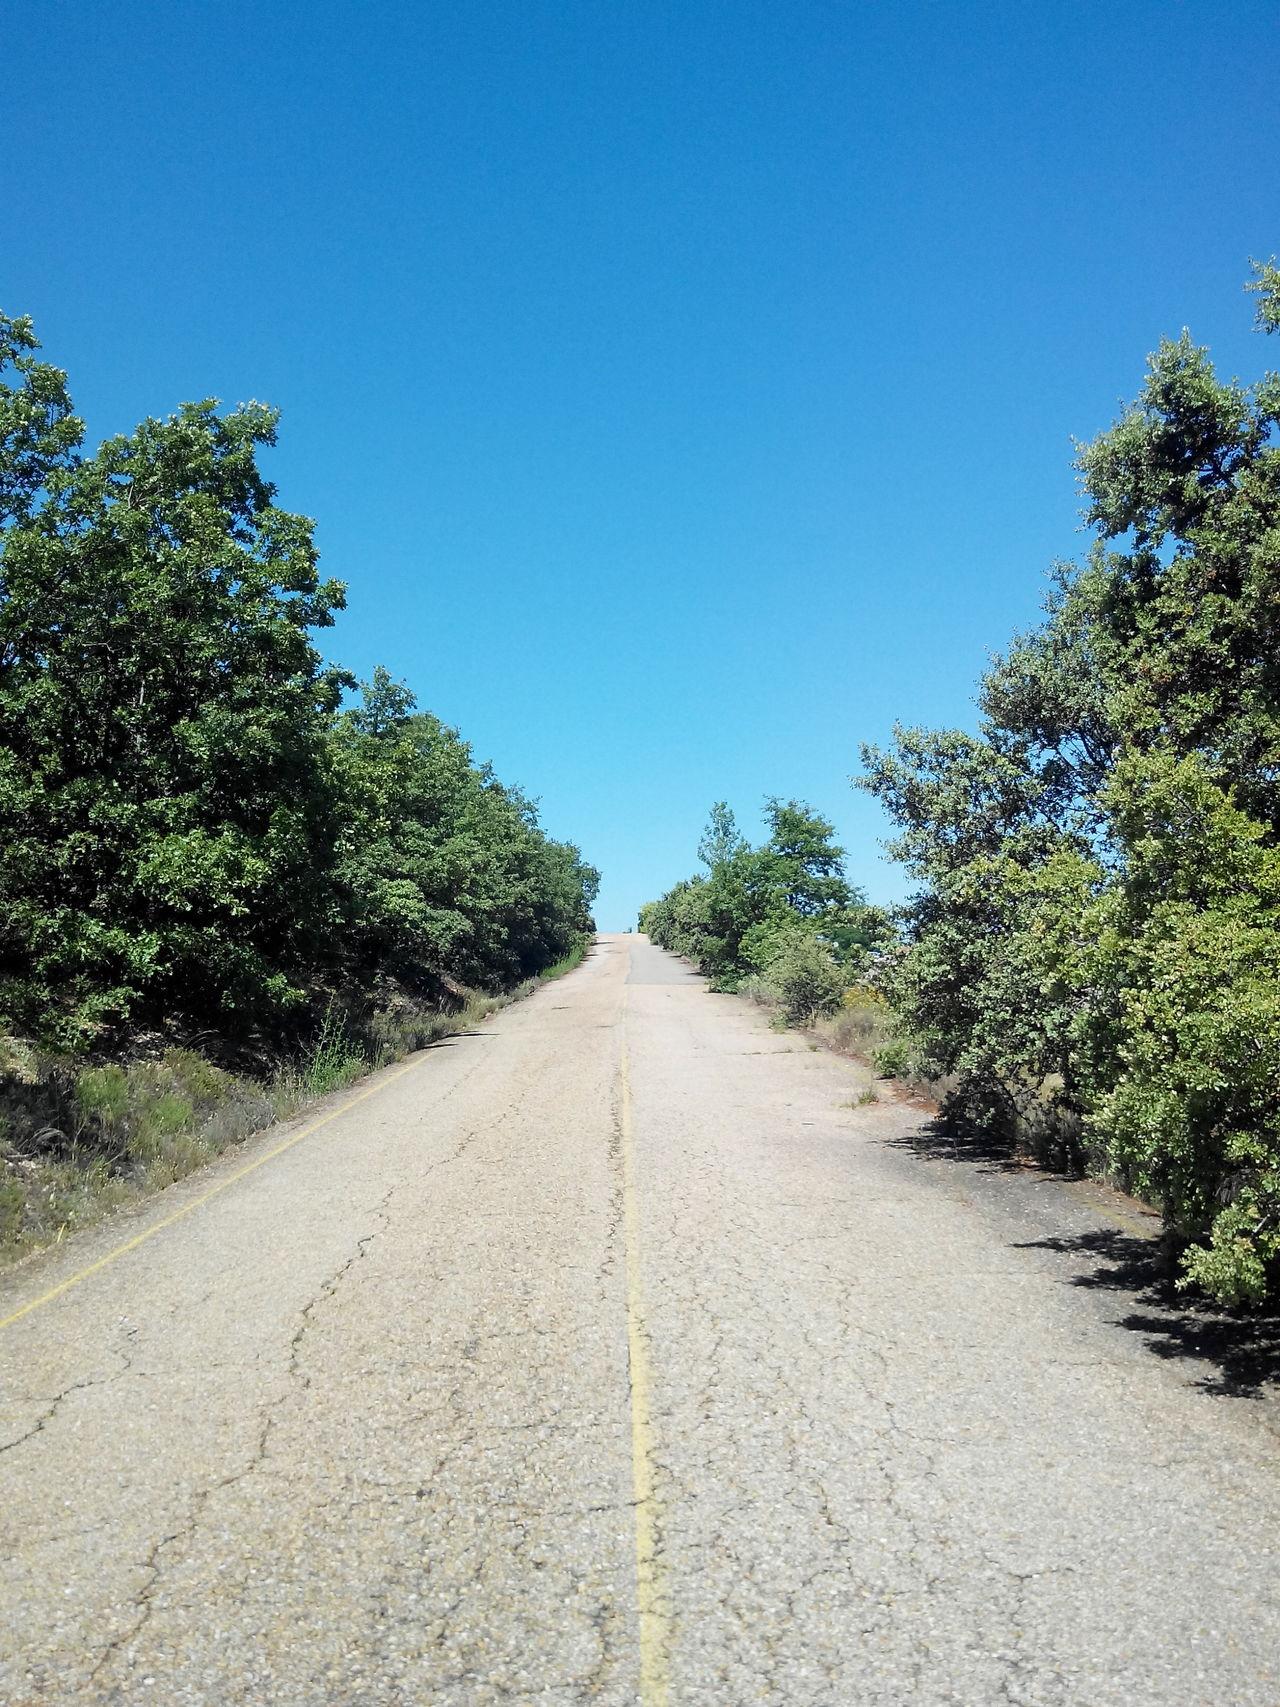 Camino CaminodeSantiago El Camino De Santiago Jakobsweg Pilgern Road Straße Street Way Of Saint James Weg Wege Und Strassen